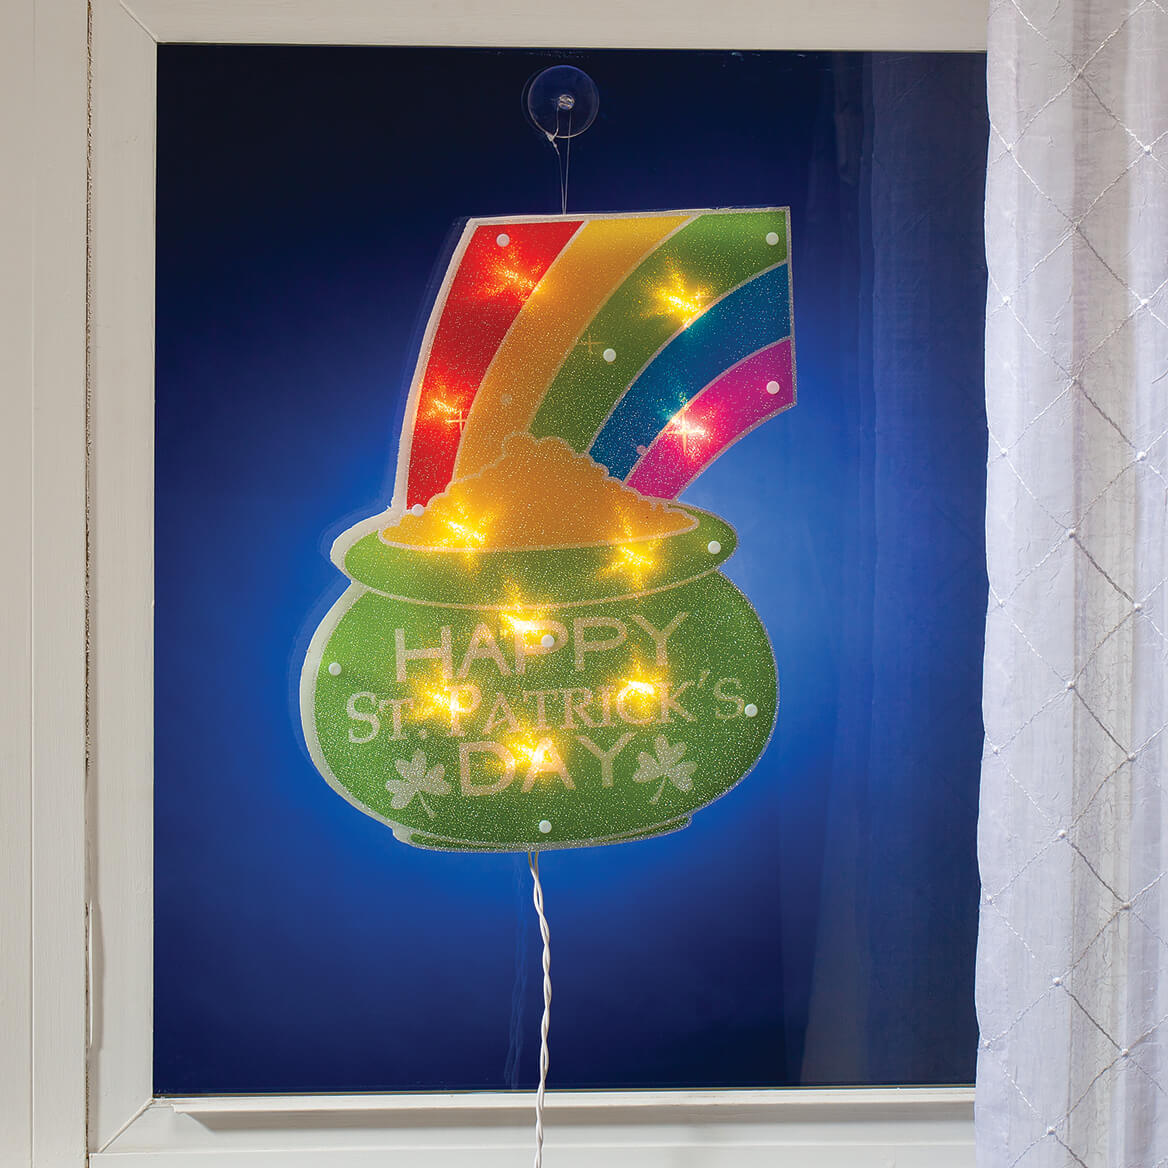 Happy St. Patrick's Day Shimmer Light-369003